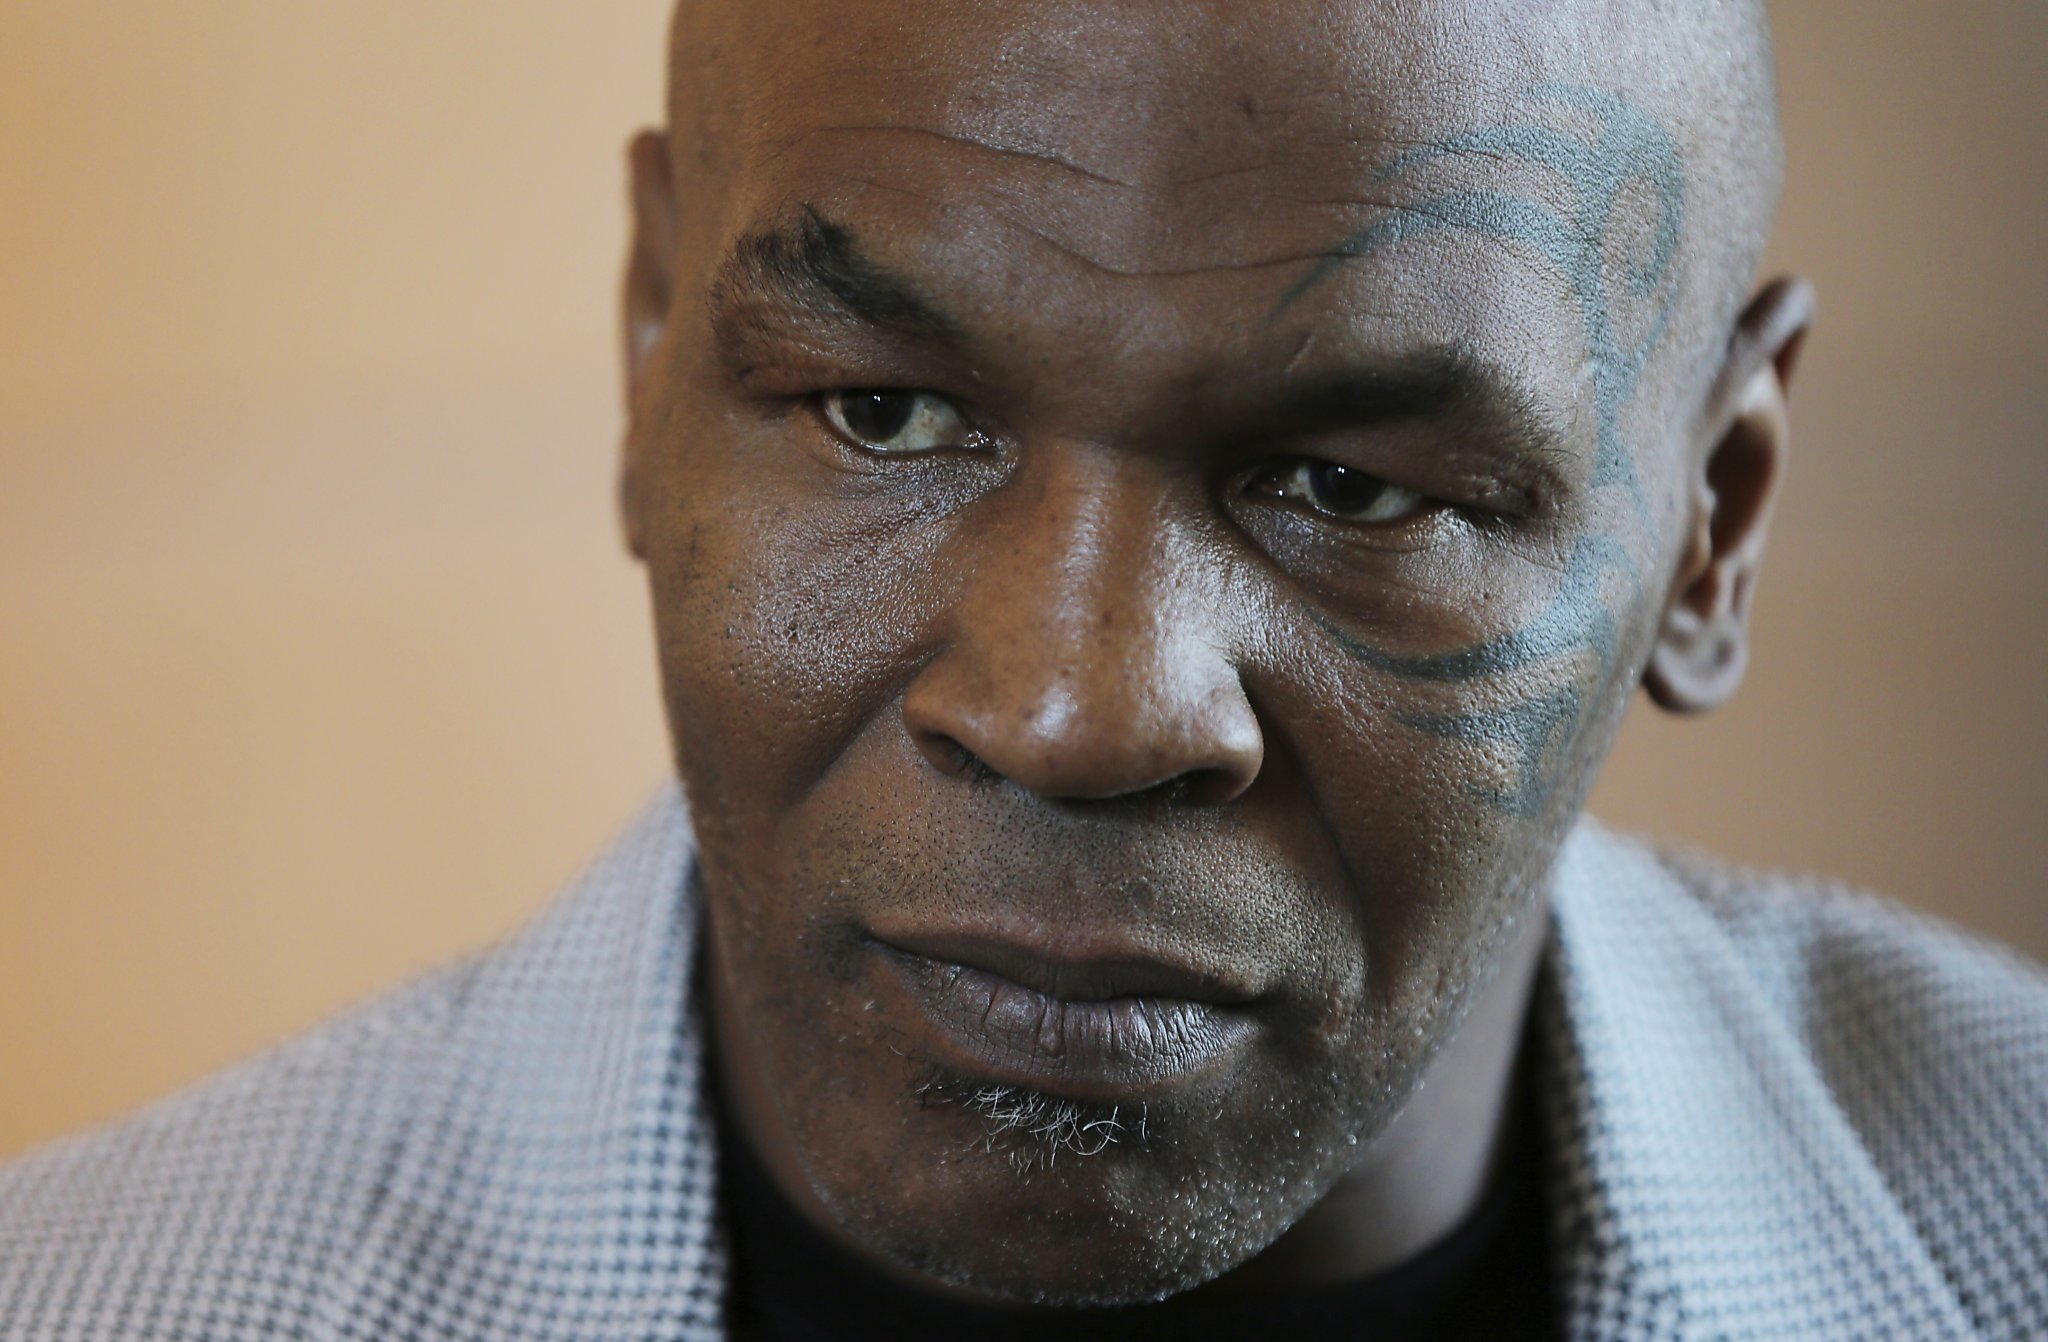 Mike Tyson breaks ground on marijuana farm and luxury resort